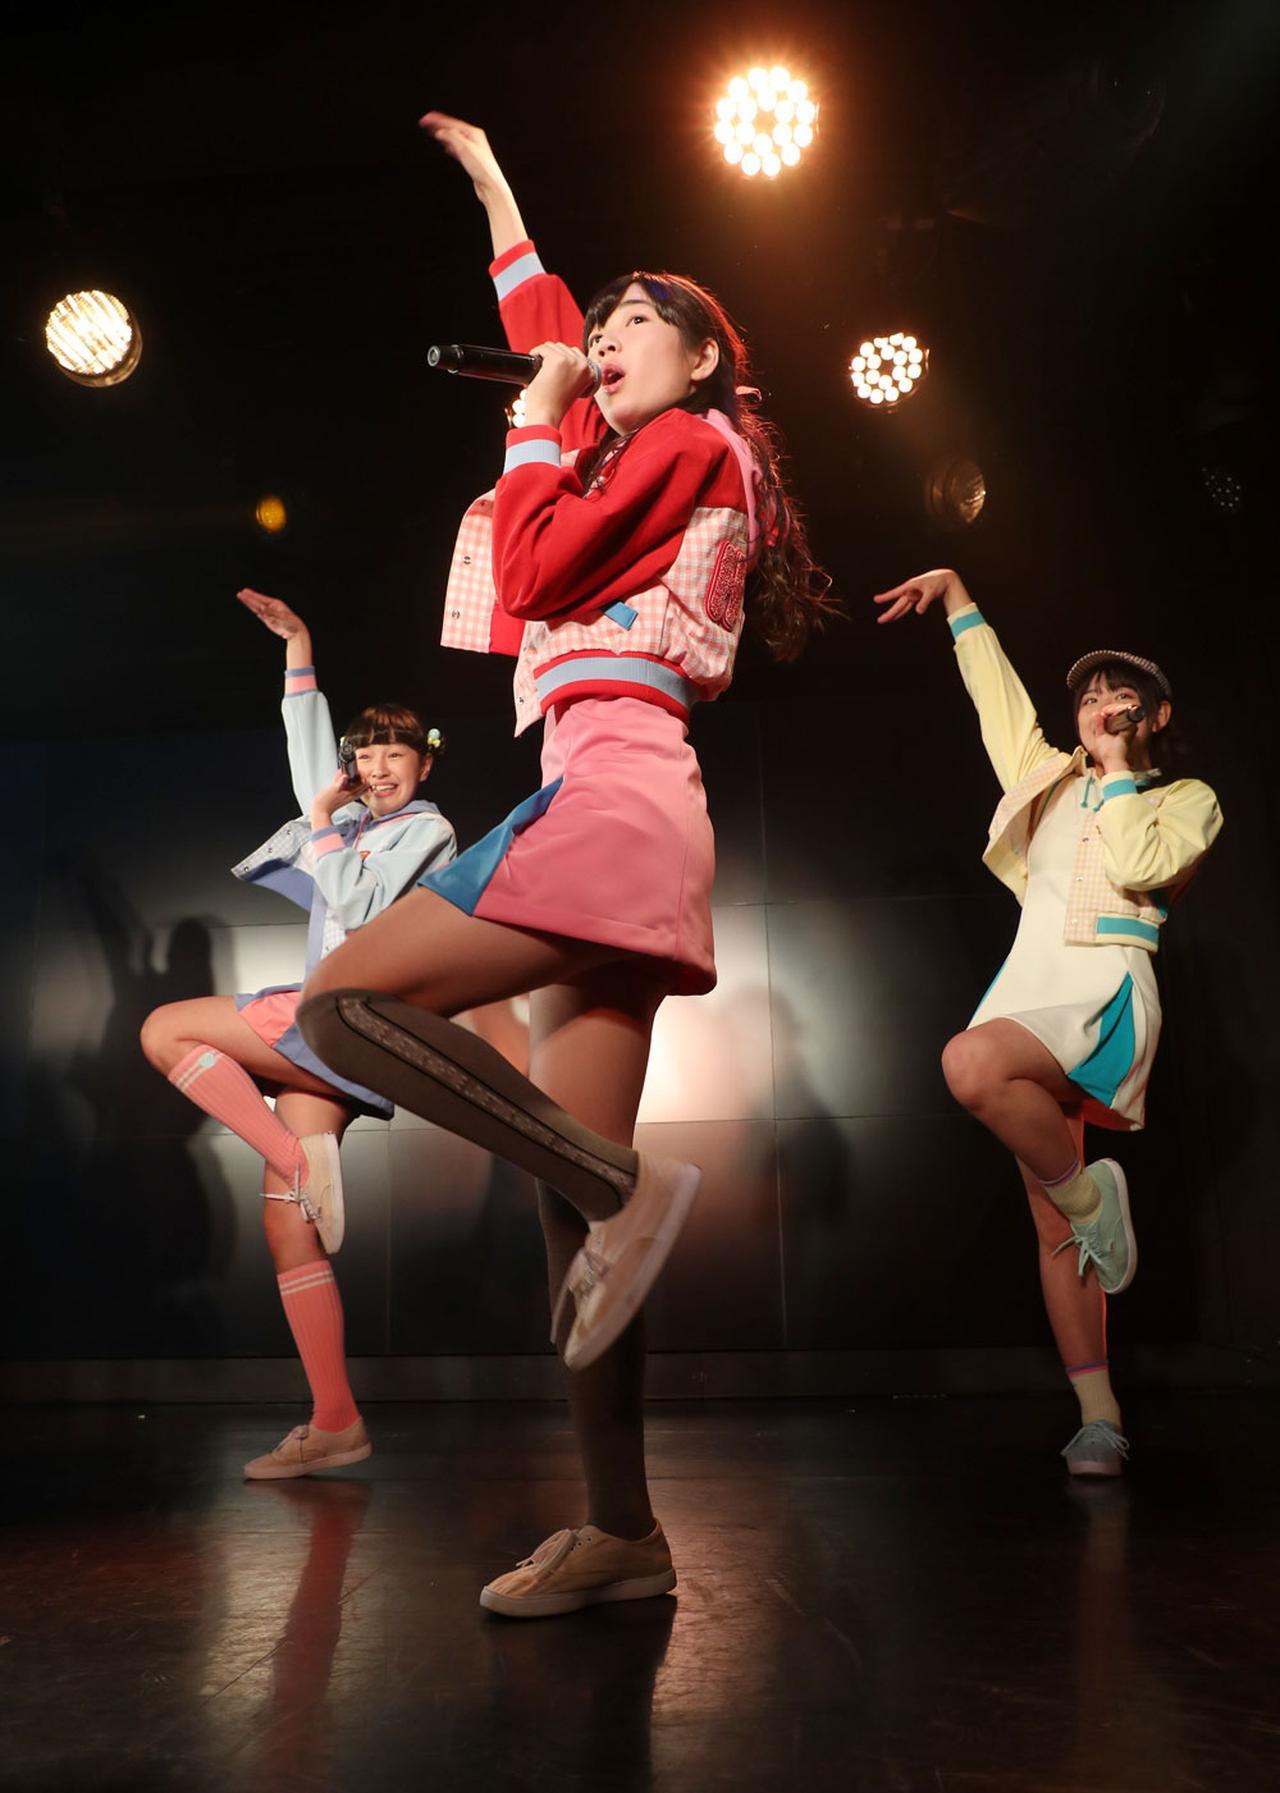 Images : 14番目の画像 - 「ハコイリムスメ/依田彩花、山本花奈を新メンバーに迎え、第5期発足。ロックンロール調の新オリジナル曲「キス取りゲーム」も披露」のアルバム - Stereo Sound ONLINE